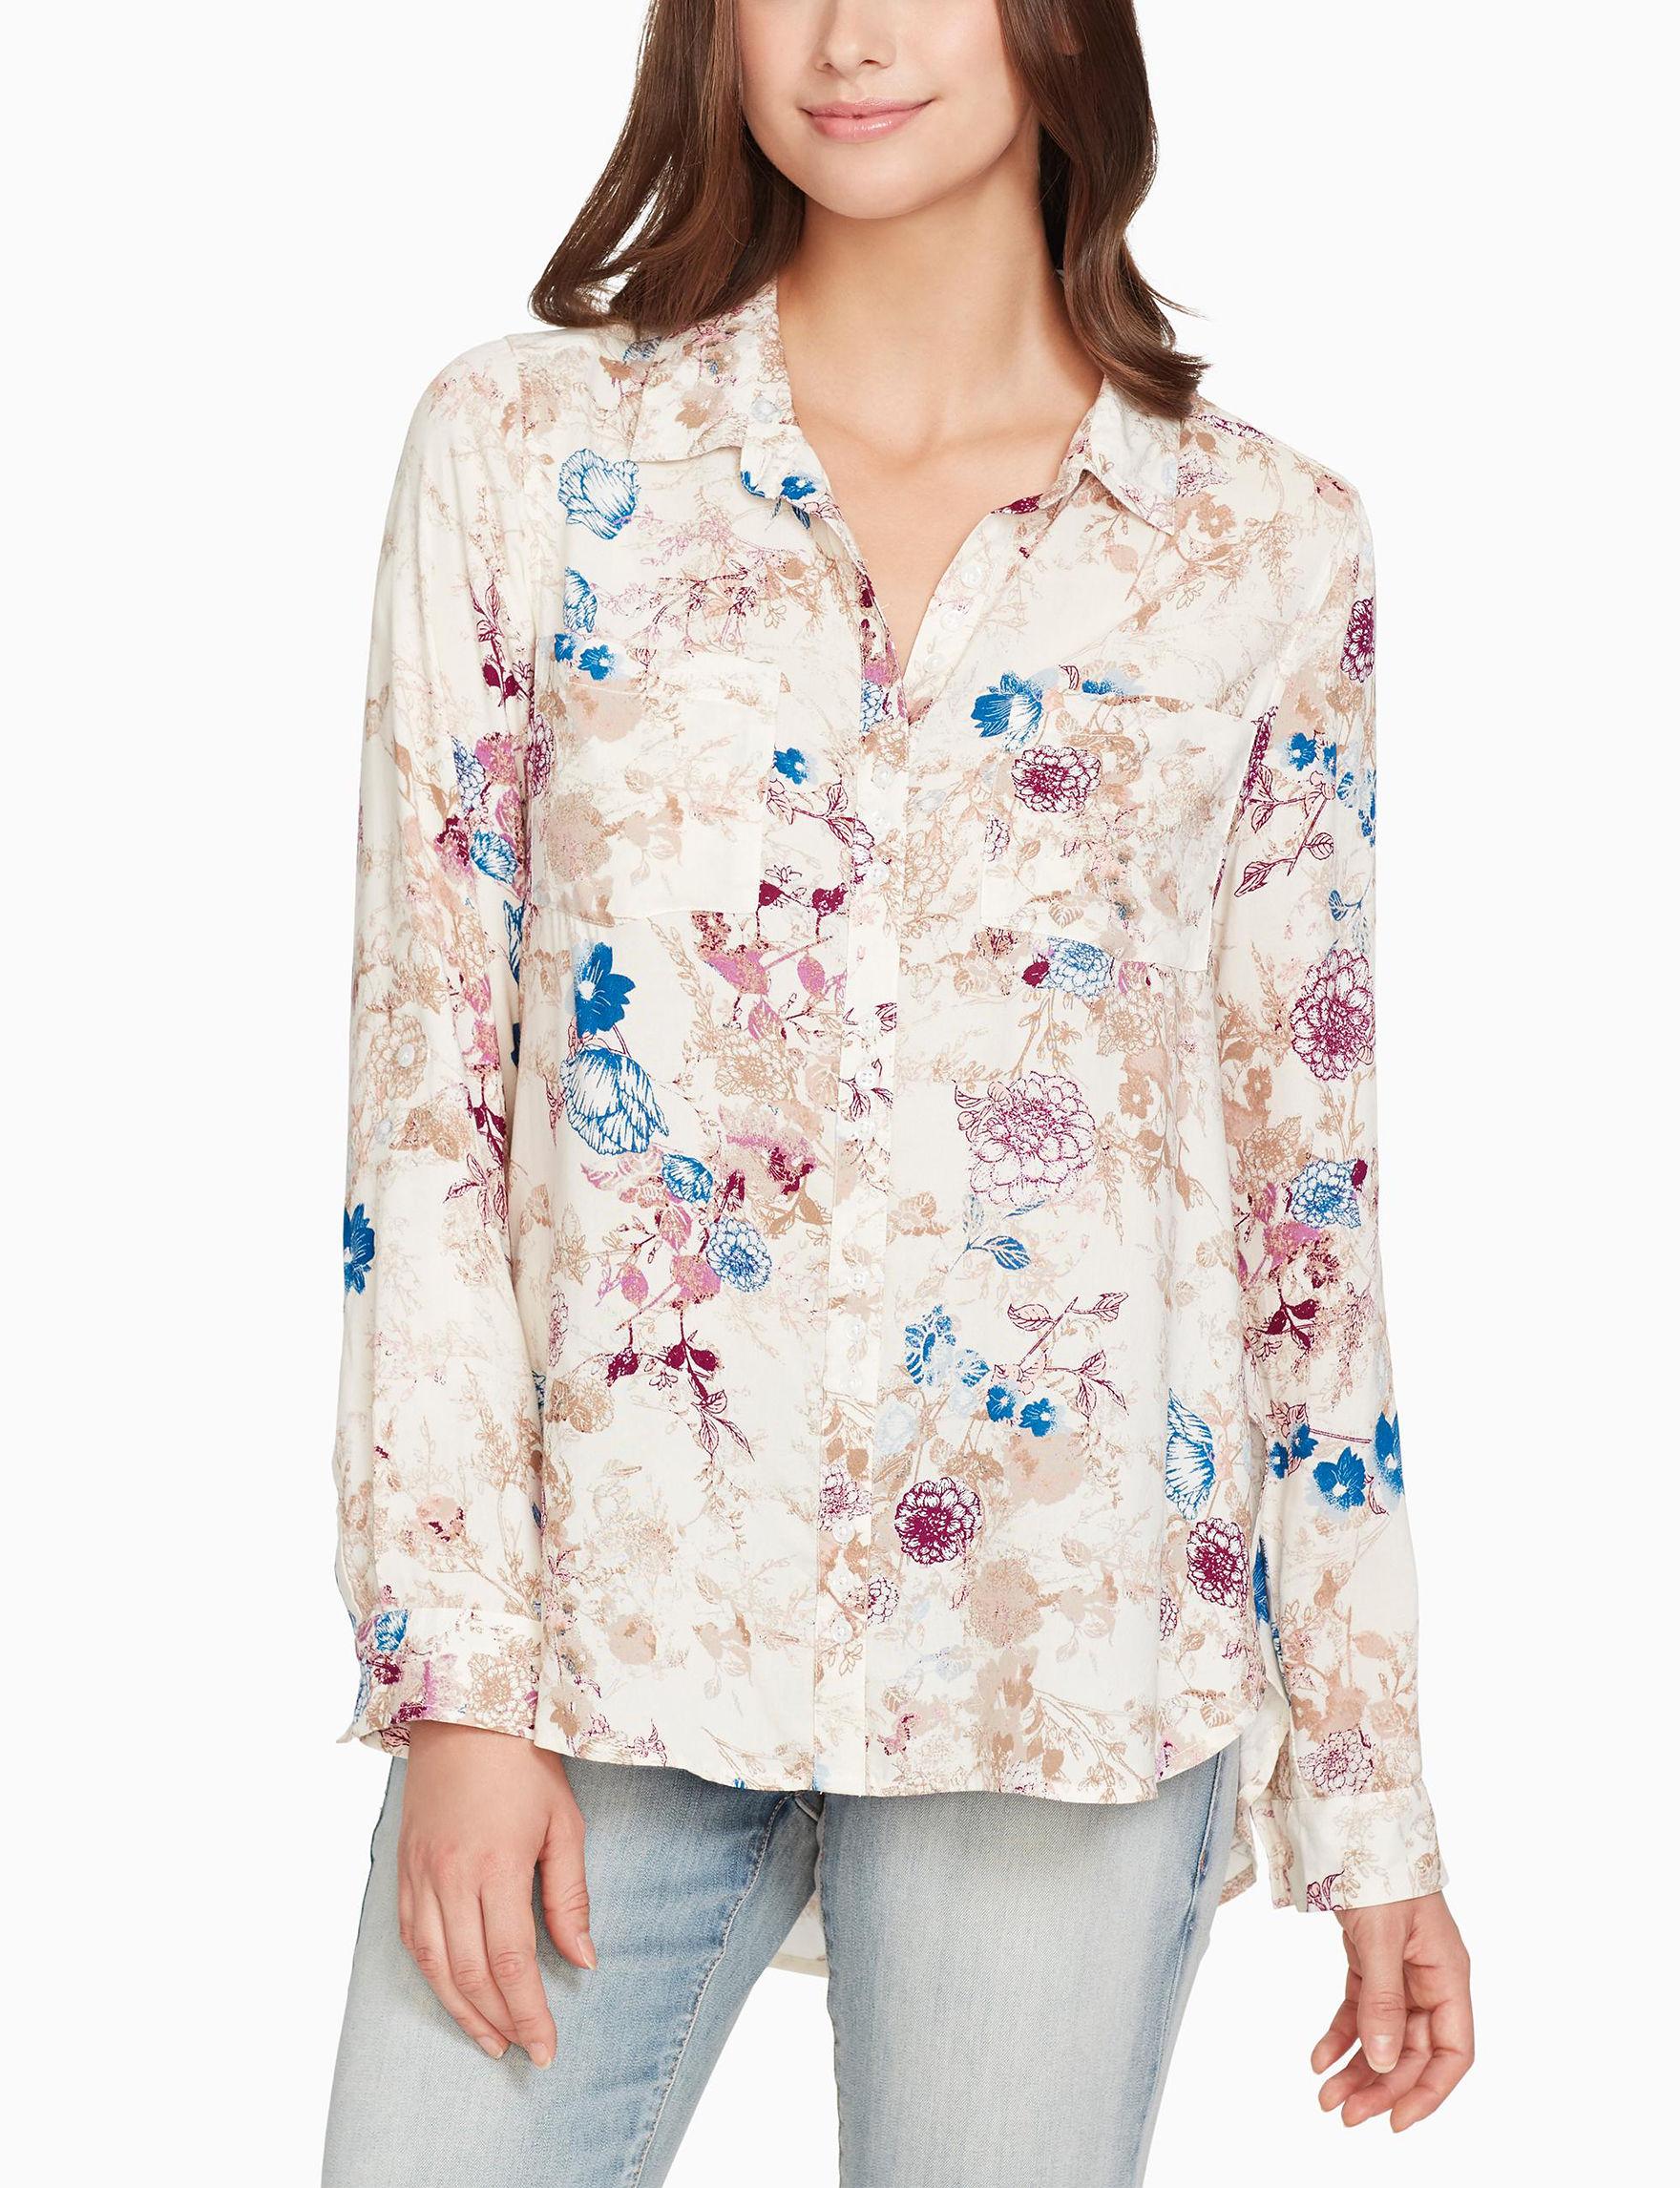 Nine West Beige Floral Shirts & Blouses